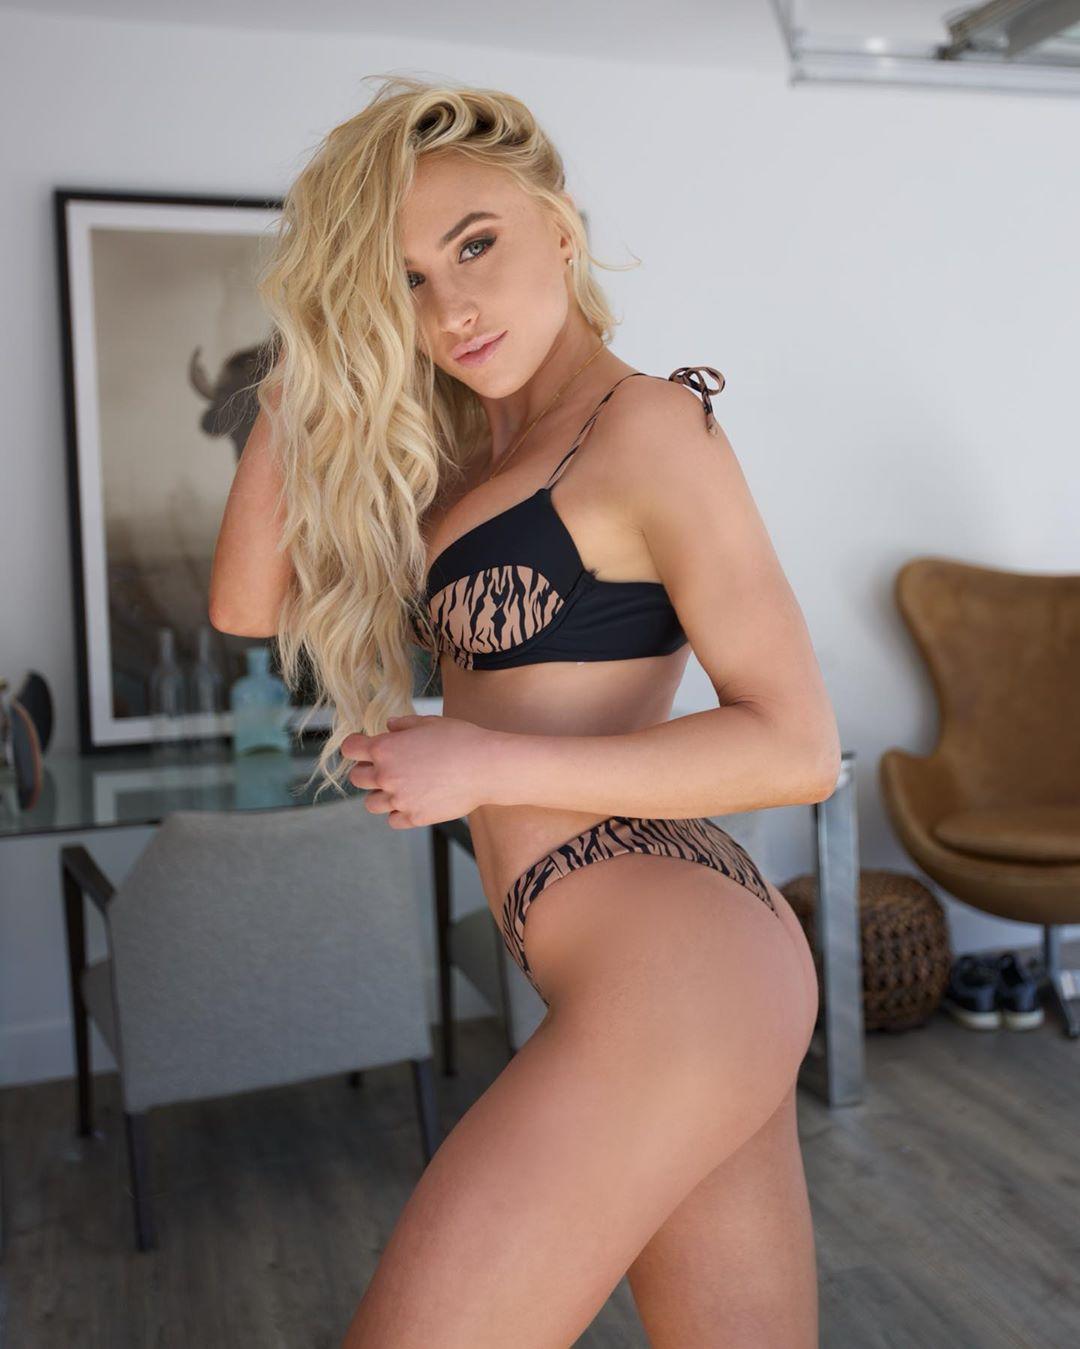 Lauren Dascalo Nude & Sex Tape Onlyfans Leaked 0032